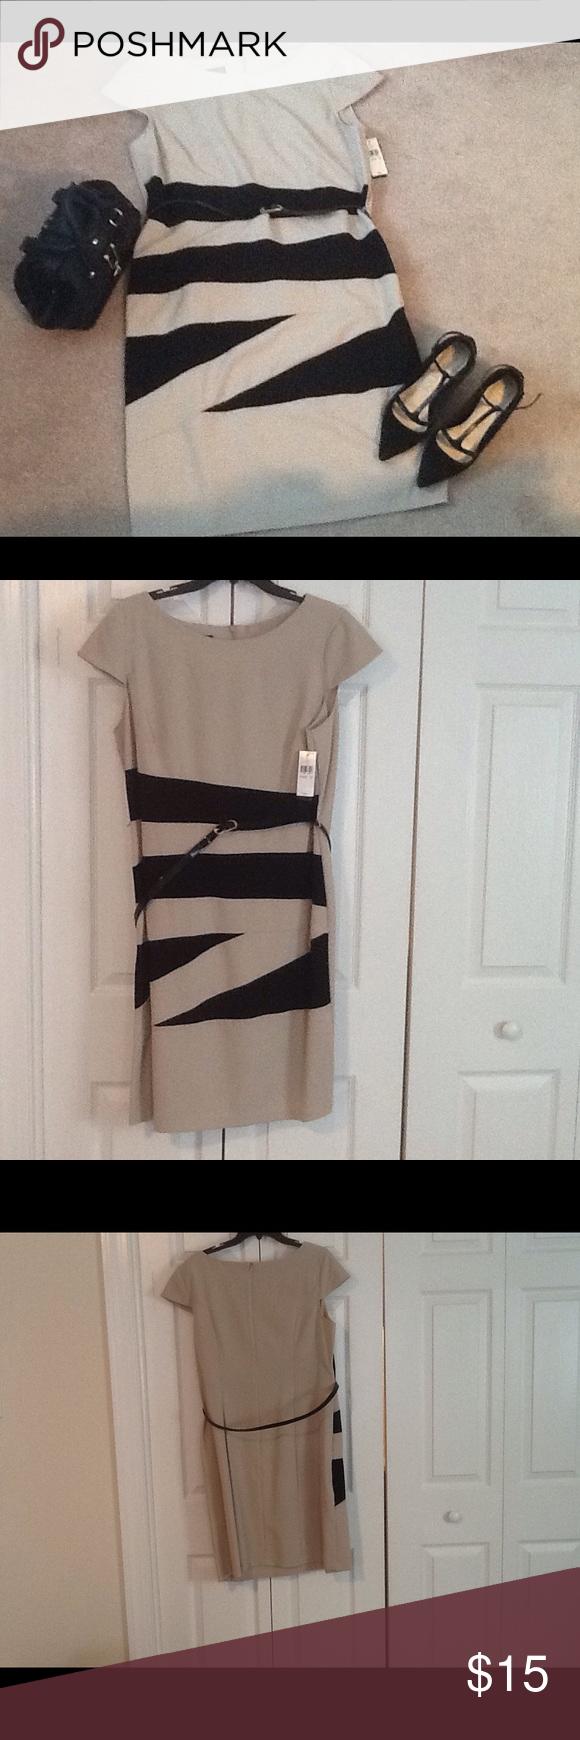 Alyssa Summer Dress Size 18 Size 18 Dress Summer Dresses Clothes Design [ 1740 x 580 Pixel ]